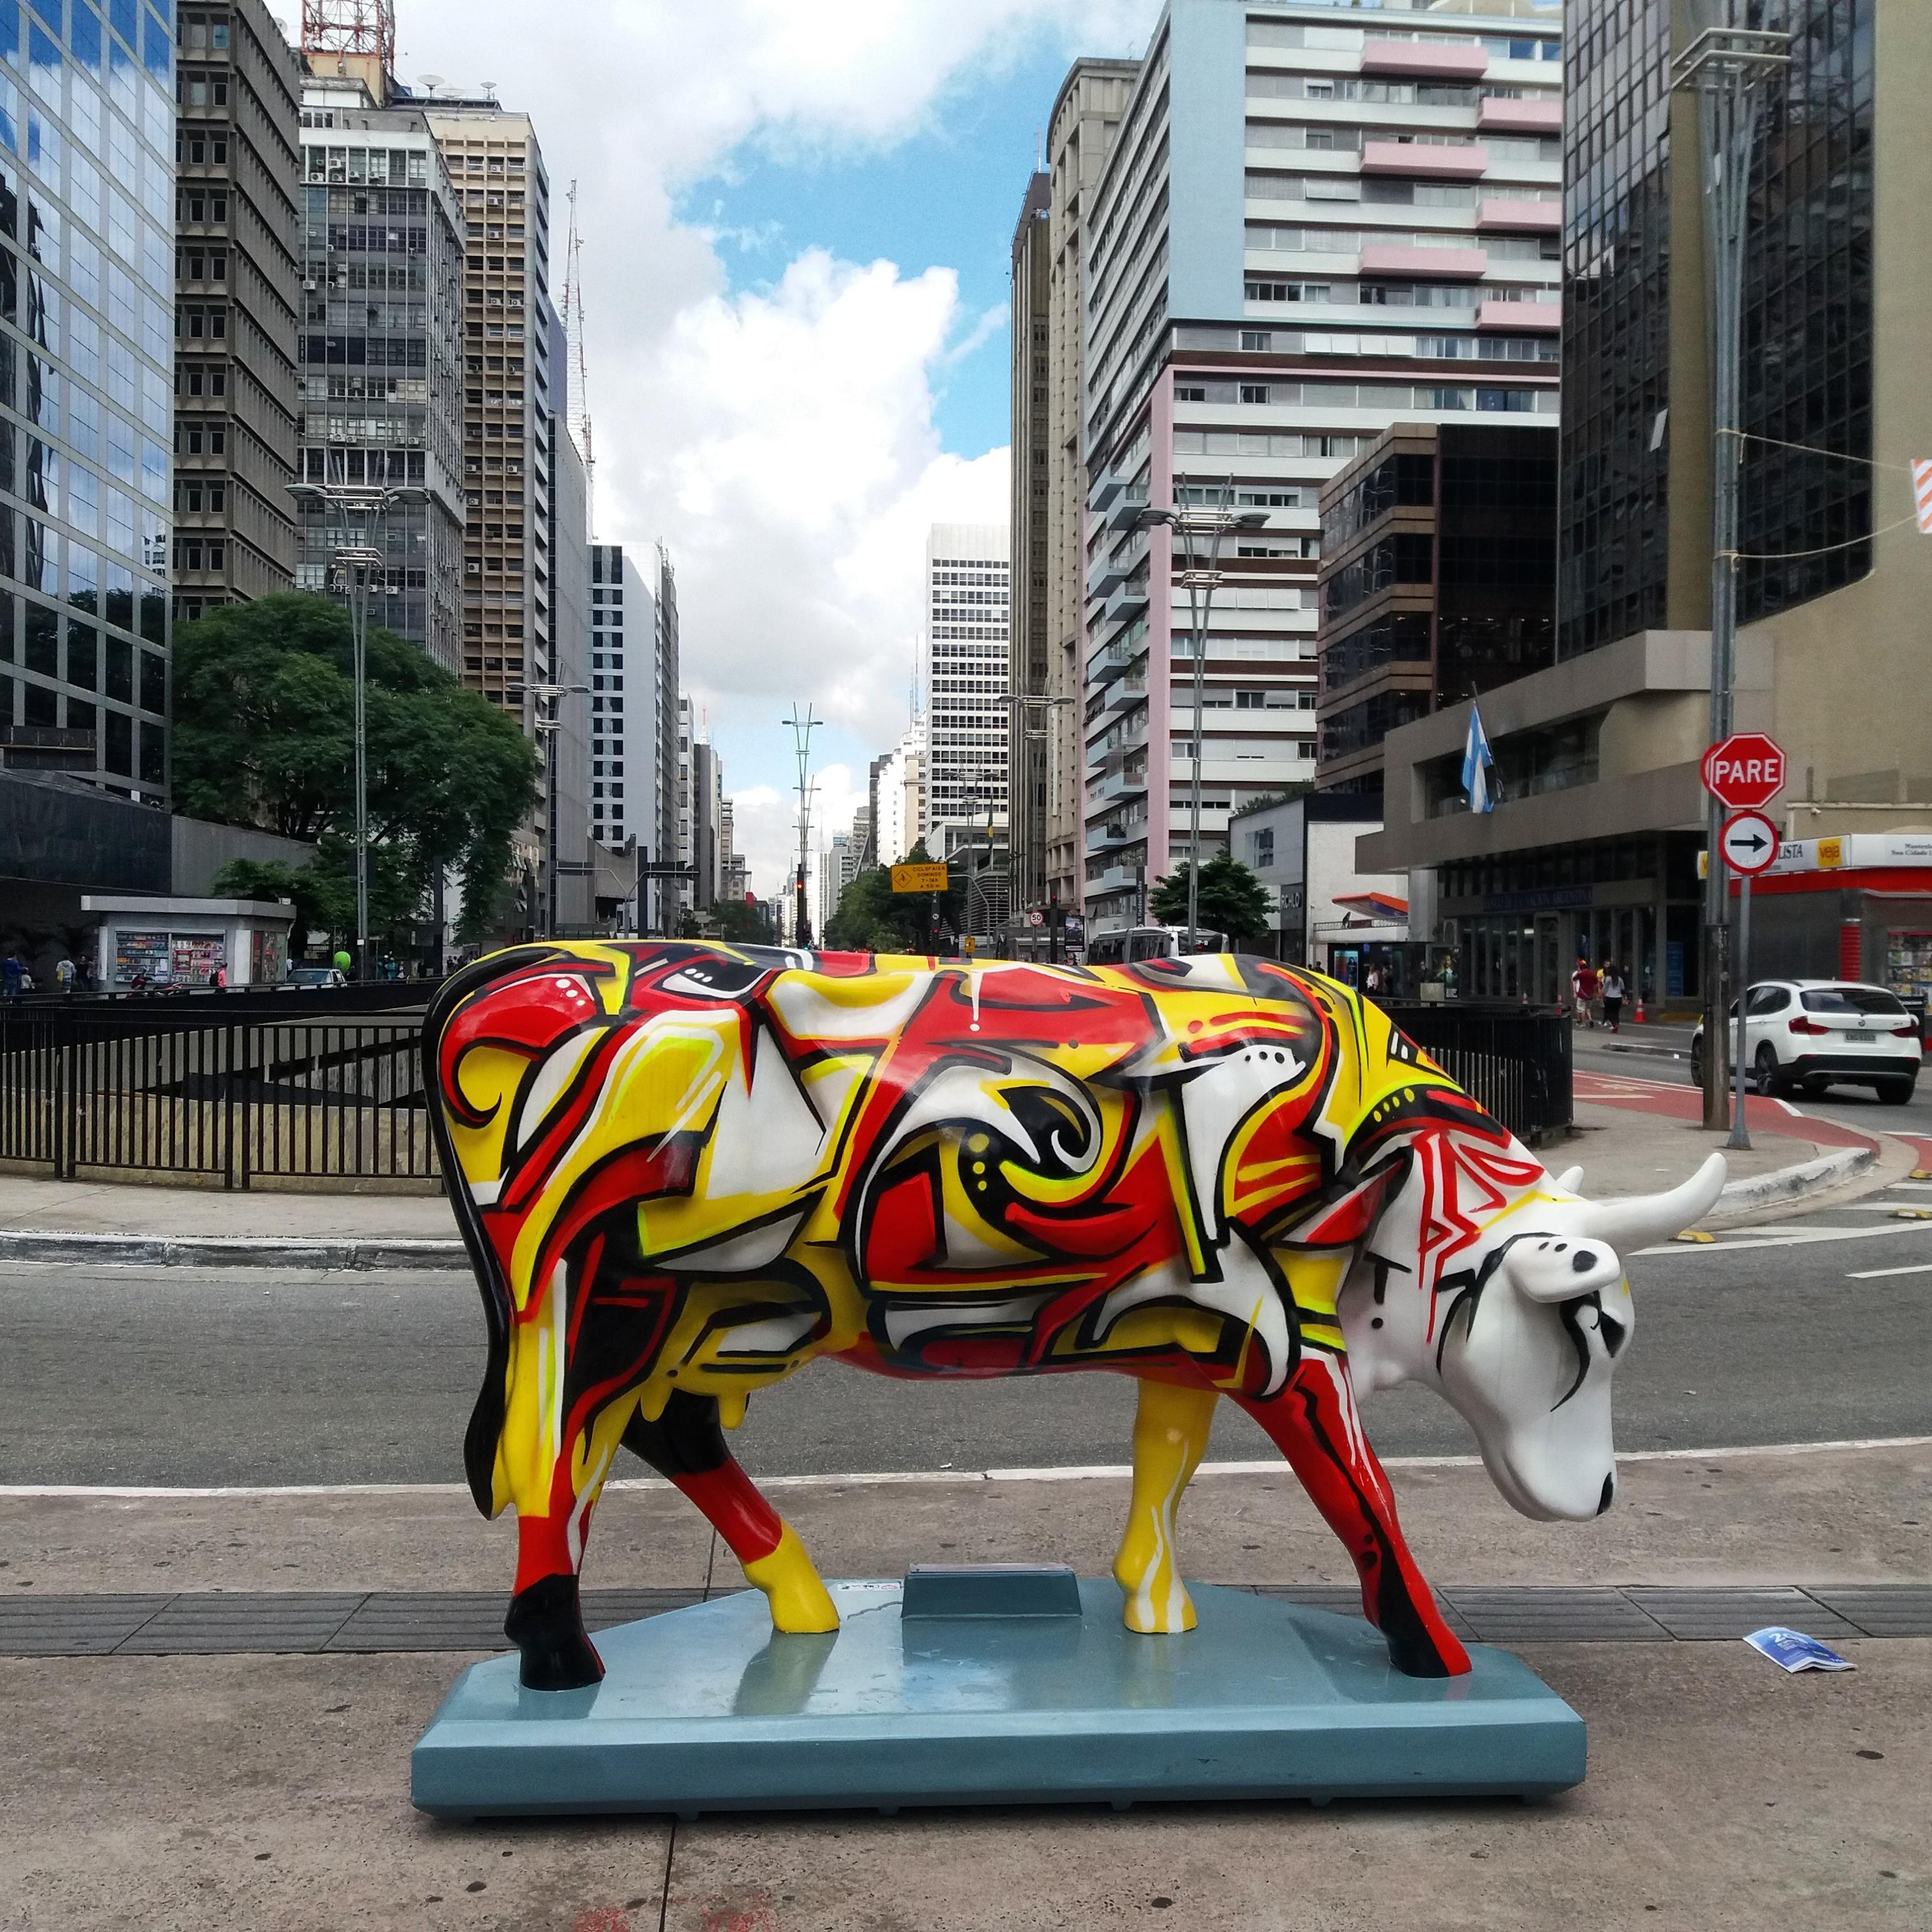 cow parede 2017 (2)